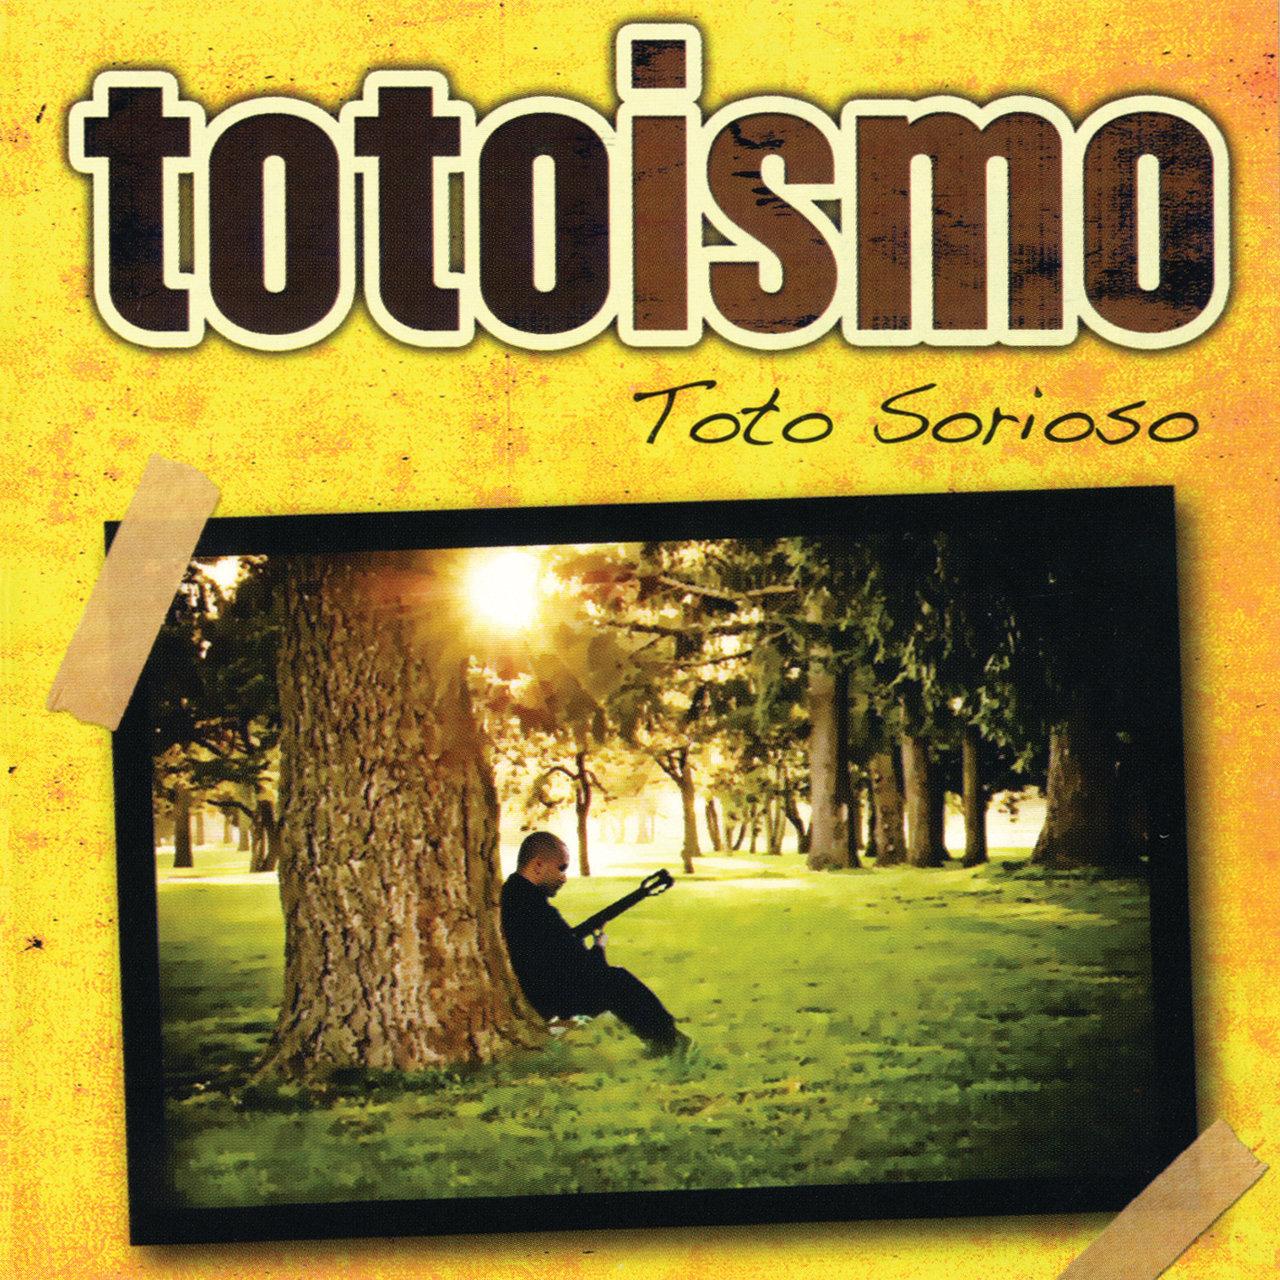 TIDAL: Listen to Toto Sorioso on TIDAL